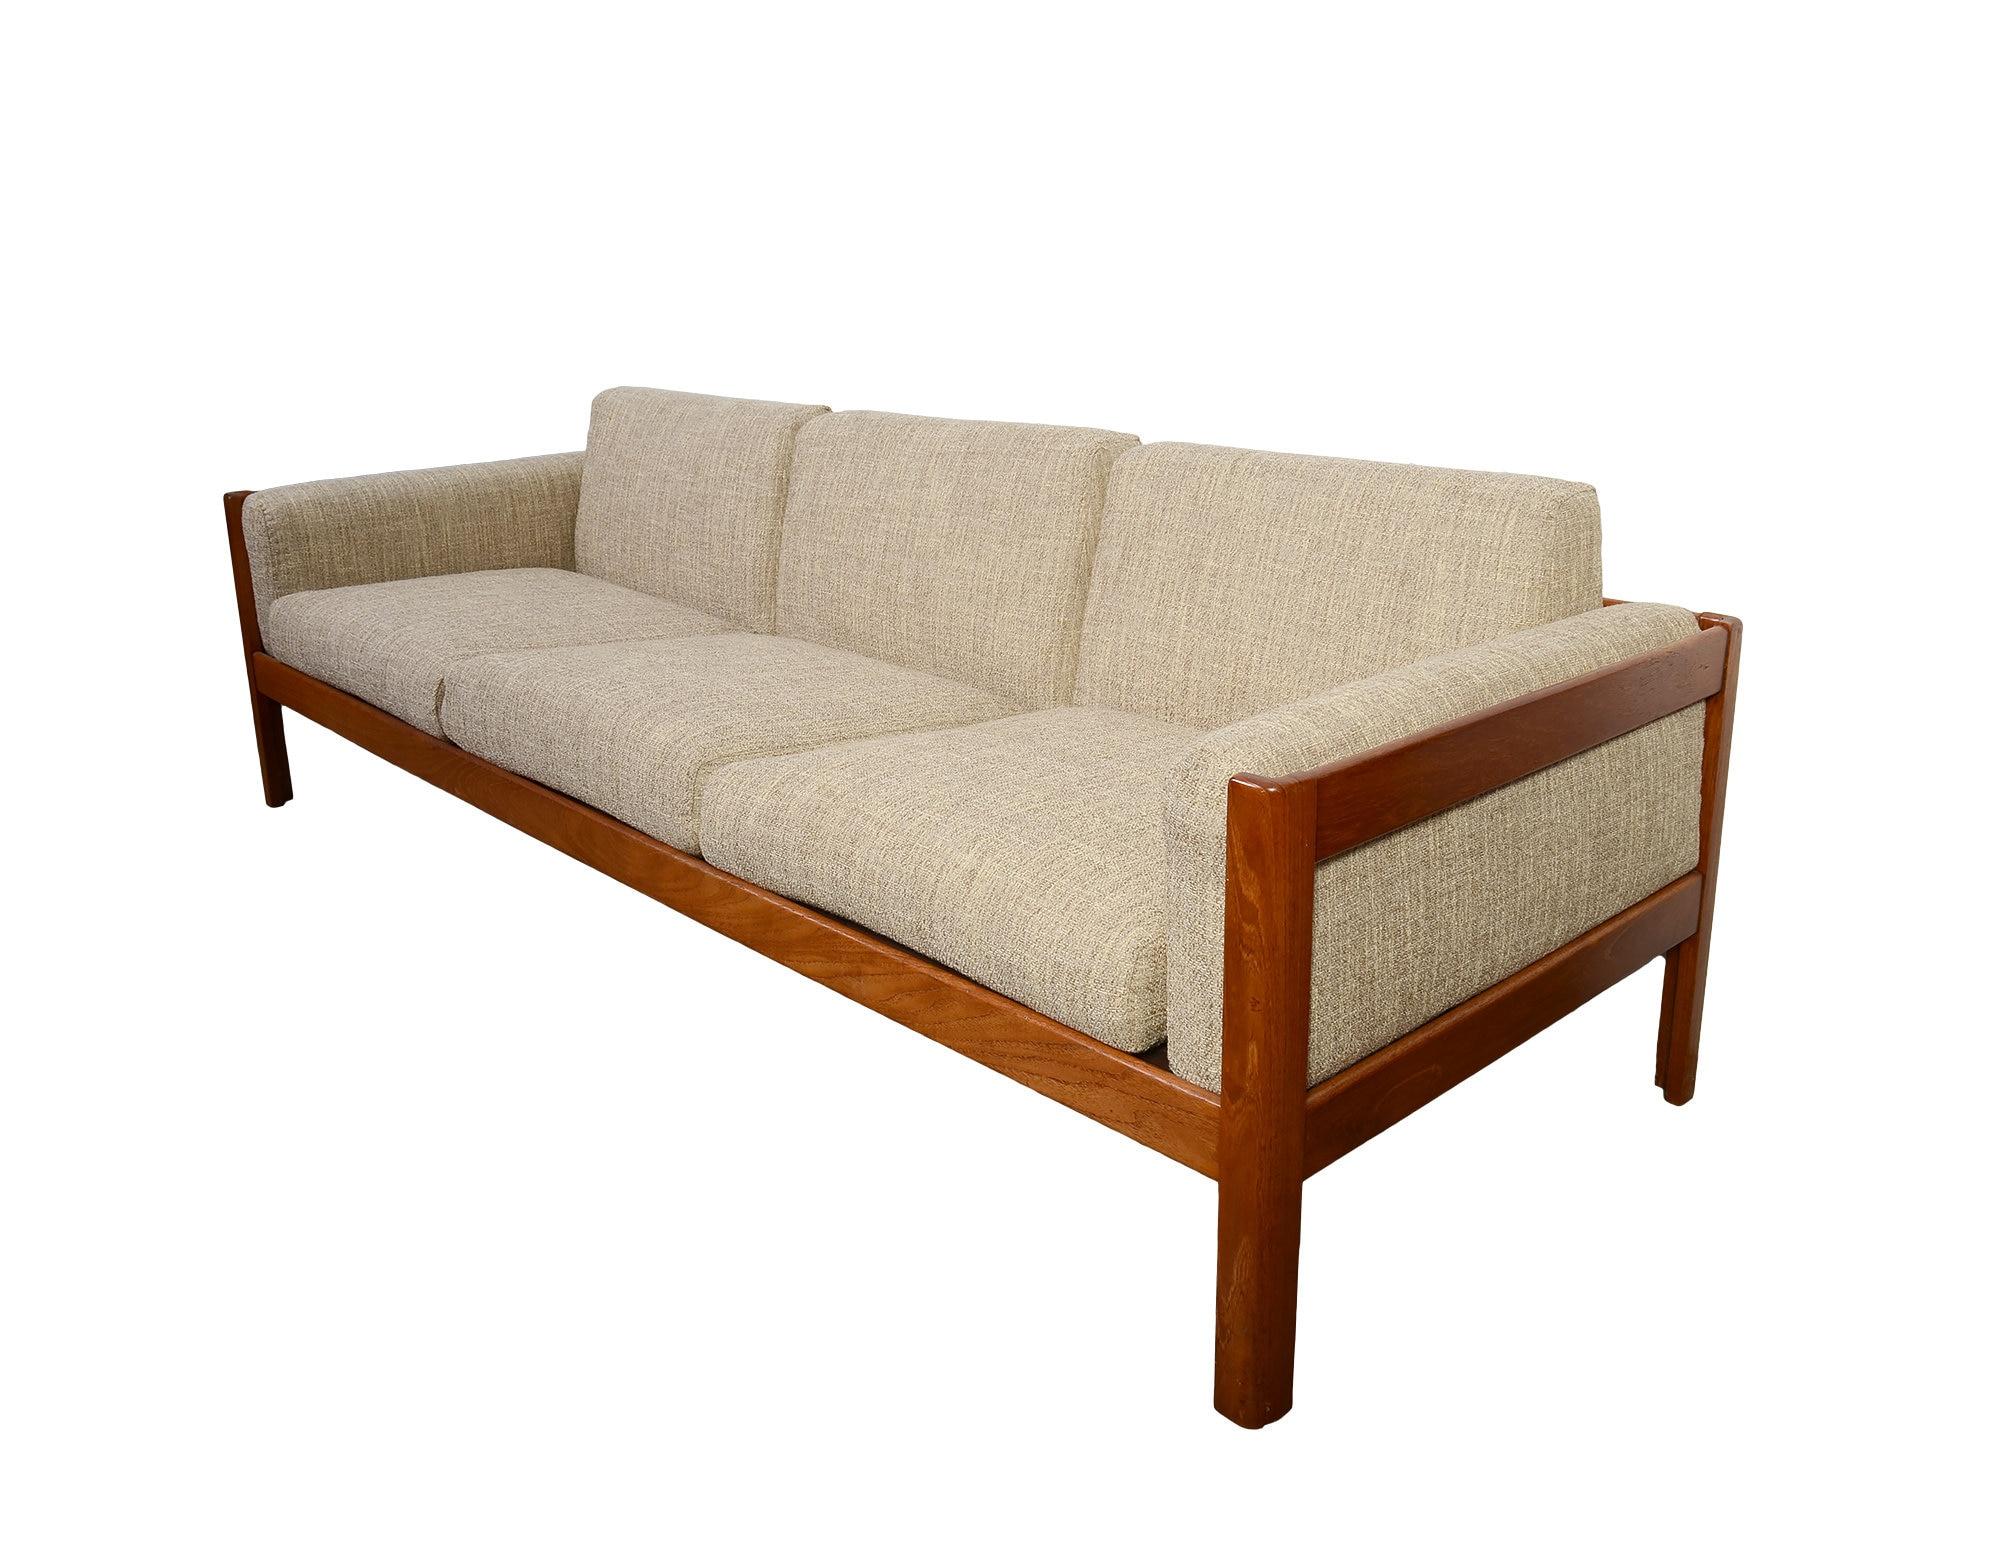 Teak Sofa Danish Modern Mid Century Modern